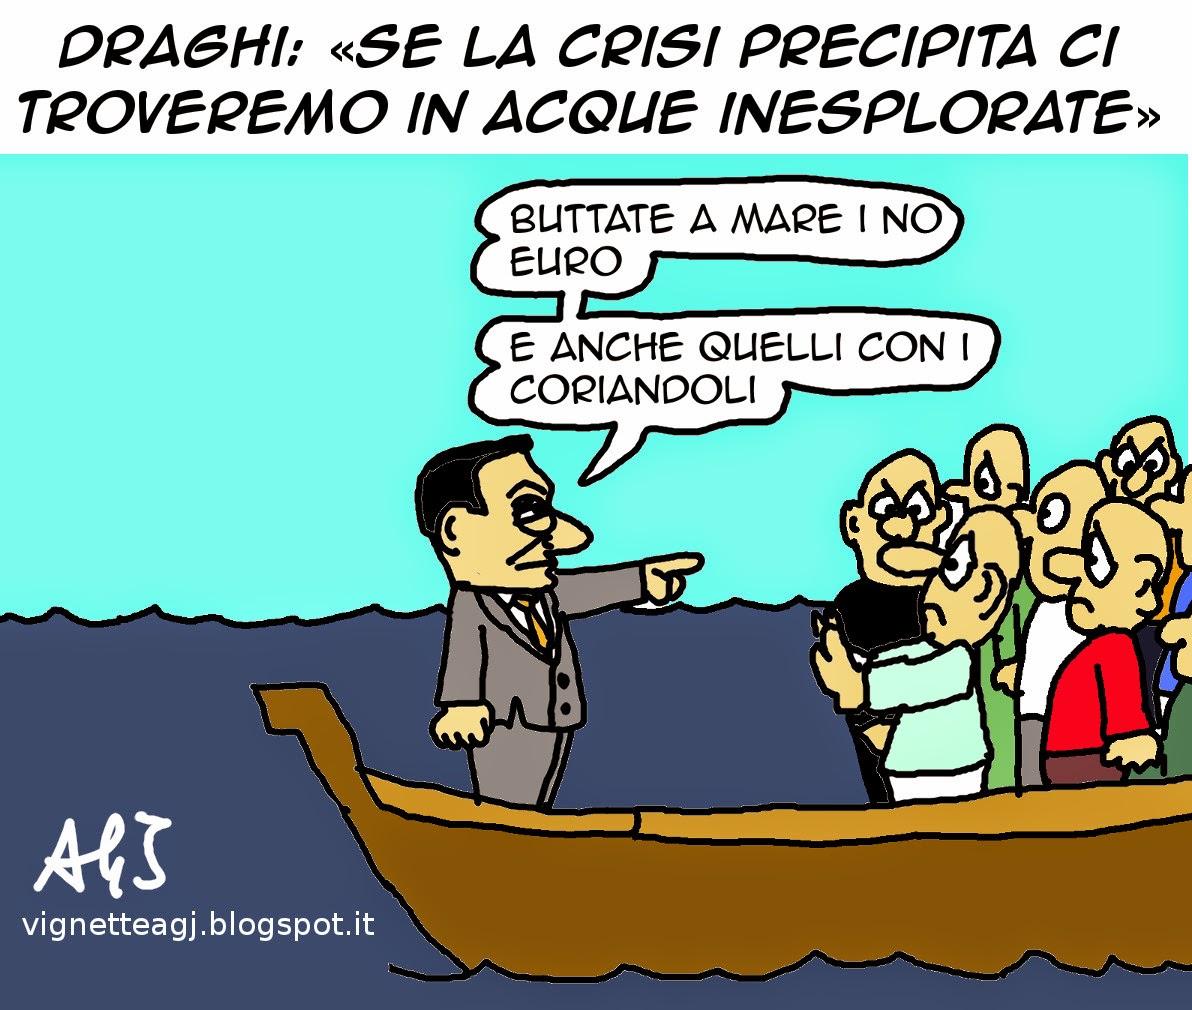 draghi, crisi, eurozona, euro, satira, vignetta